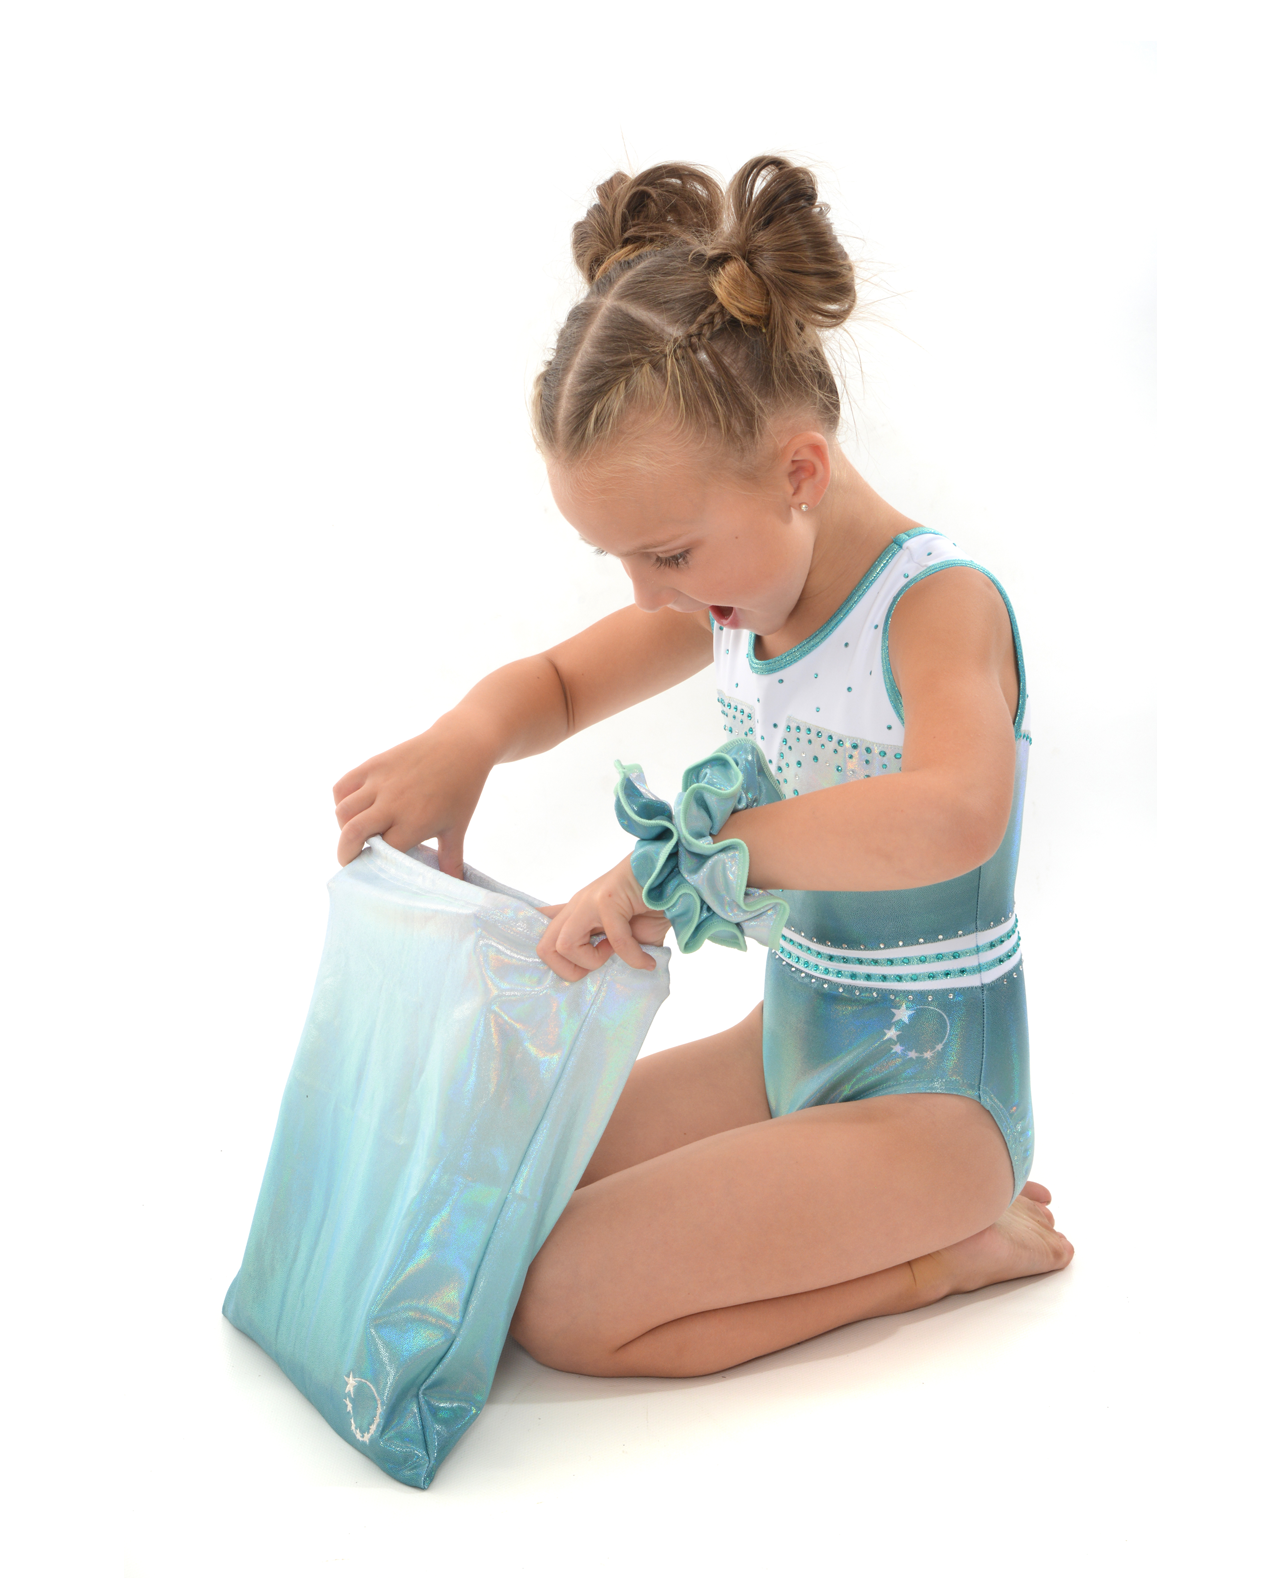 gymnastics leotard cute holographic mint ombre matching bag